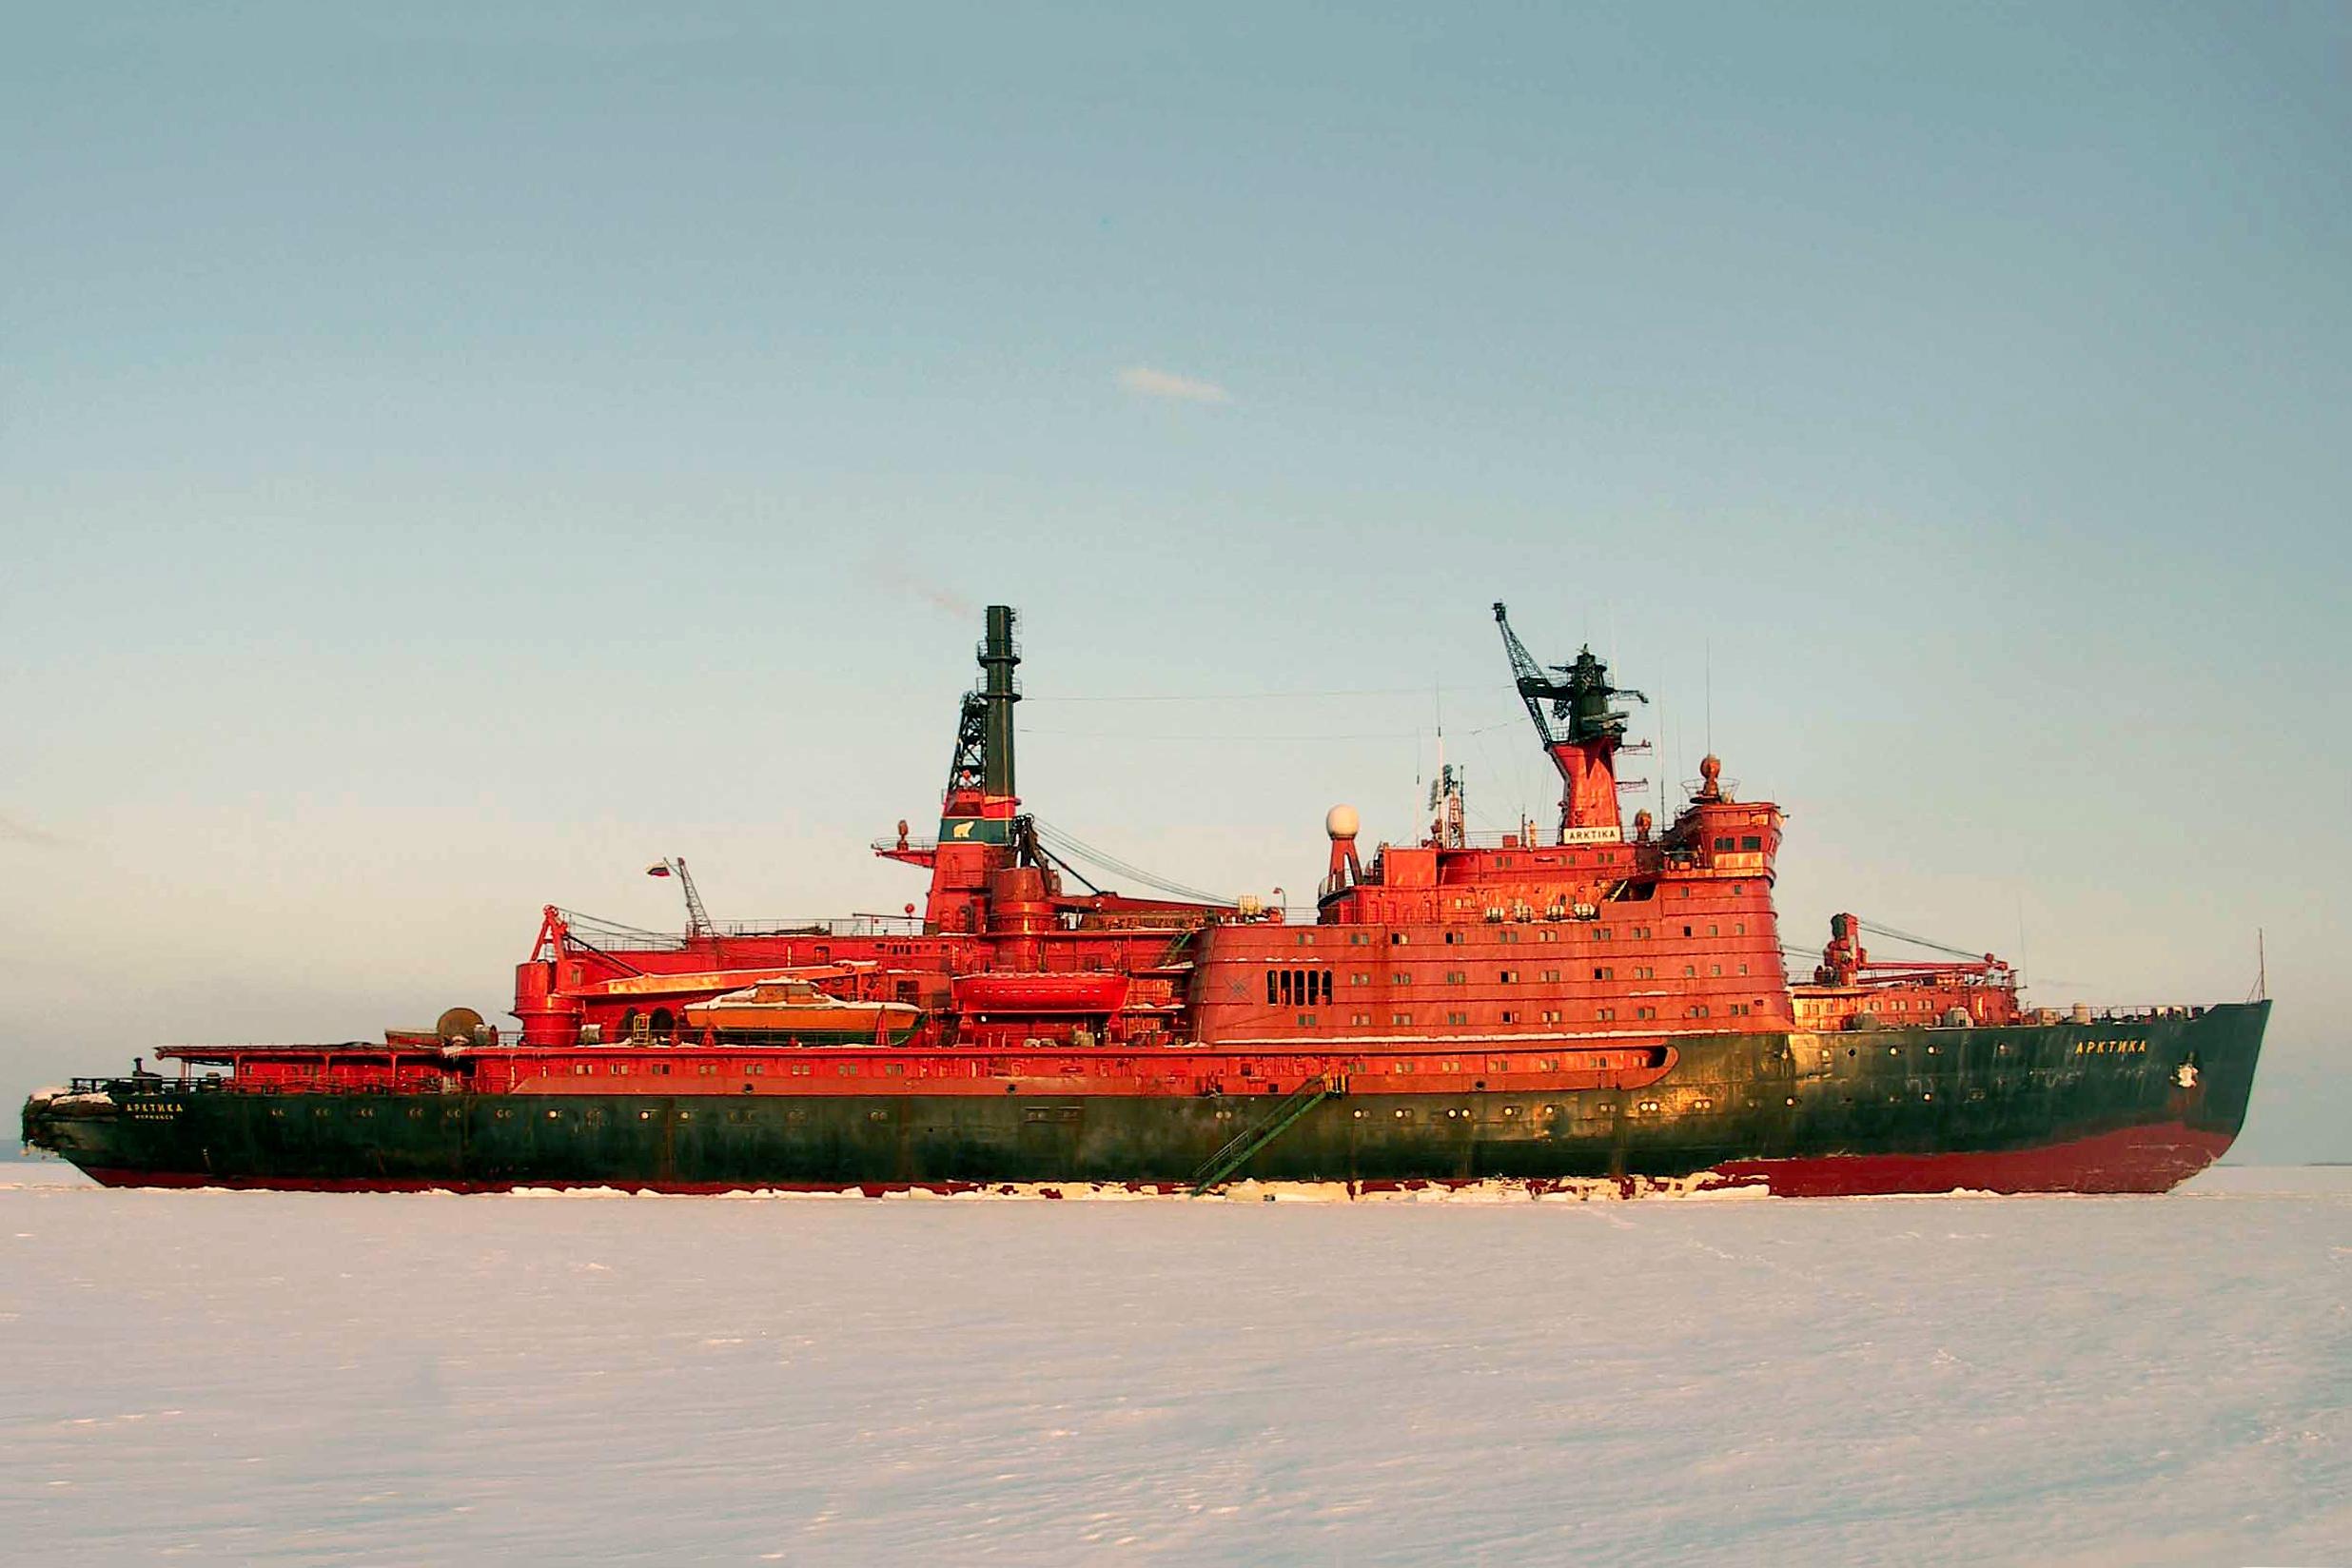 Russian_Nuclear_Icebreaker_Arktika.jpg